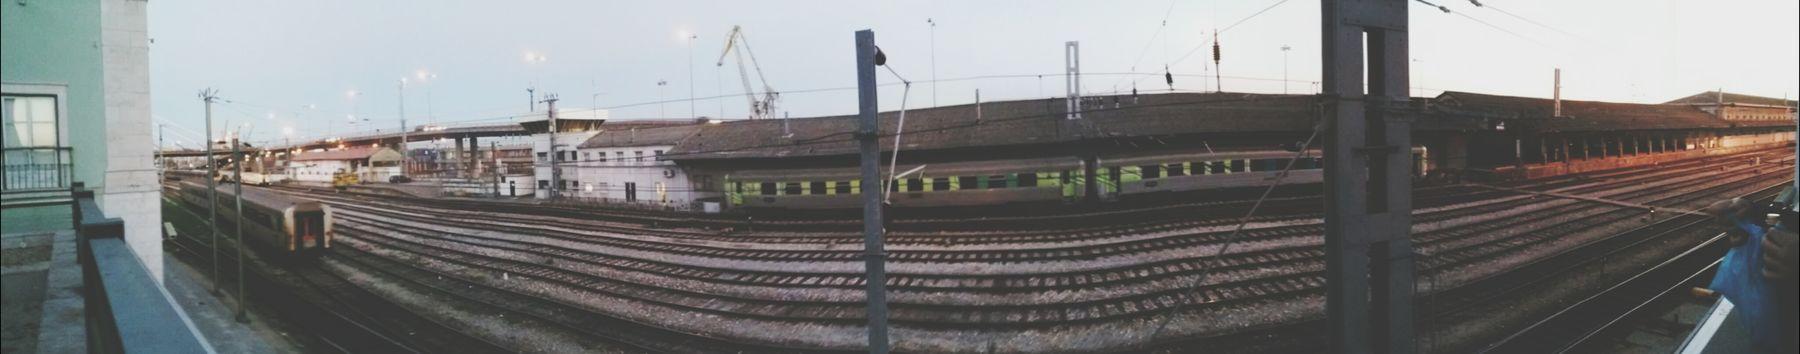 Trainspotting Trainyard